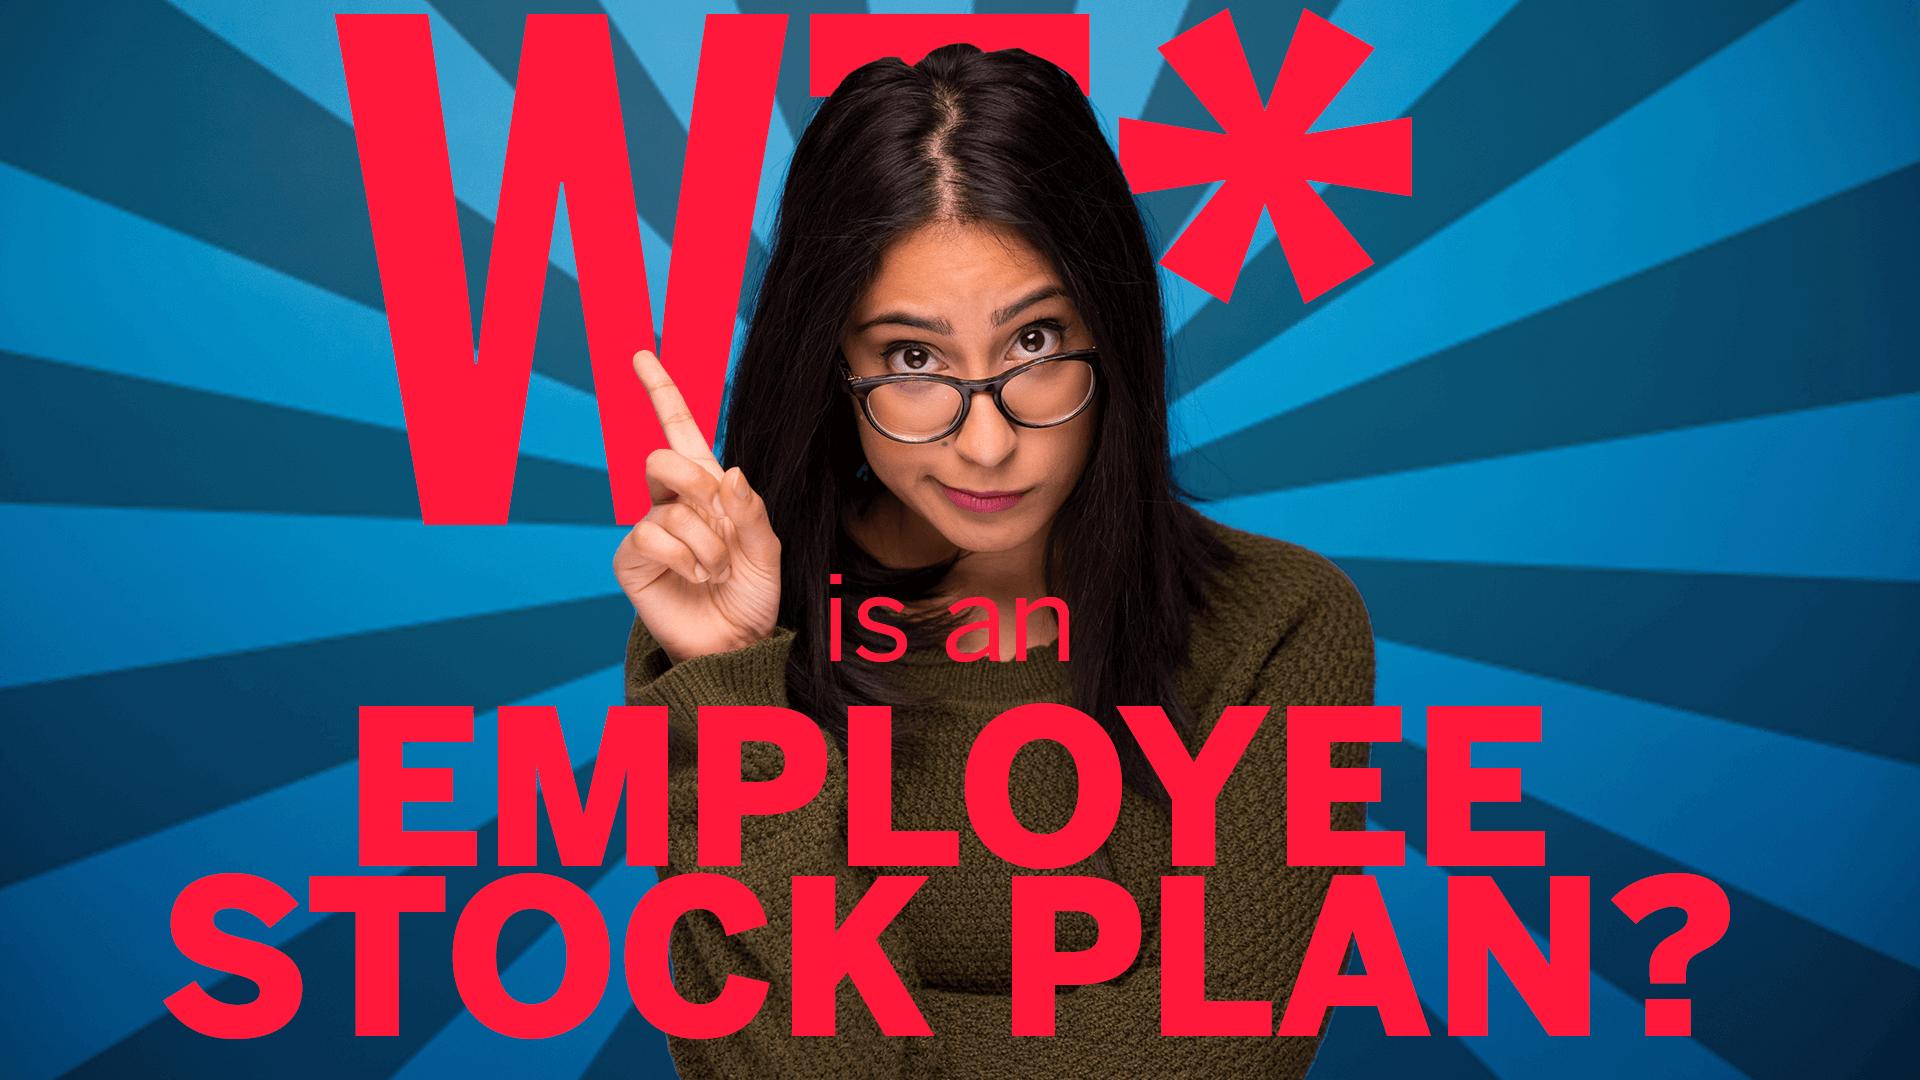 employee stock plan, employee share accumulation plan, free money